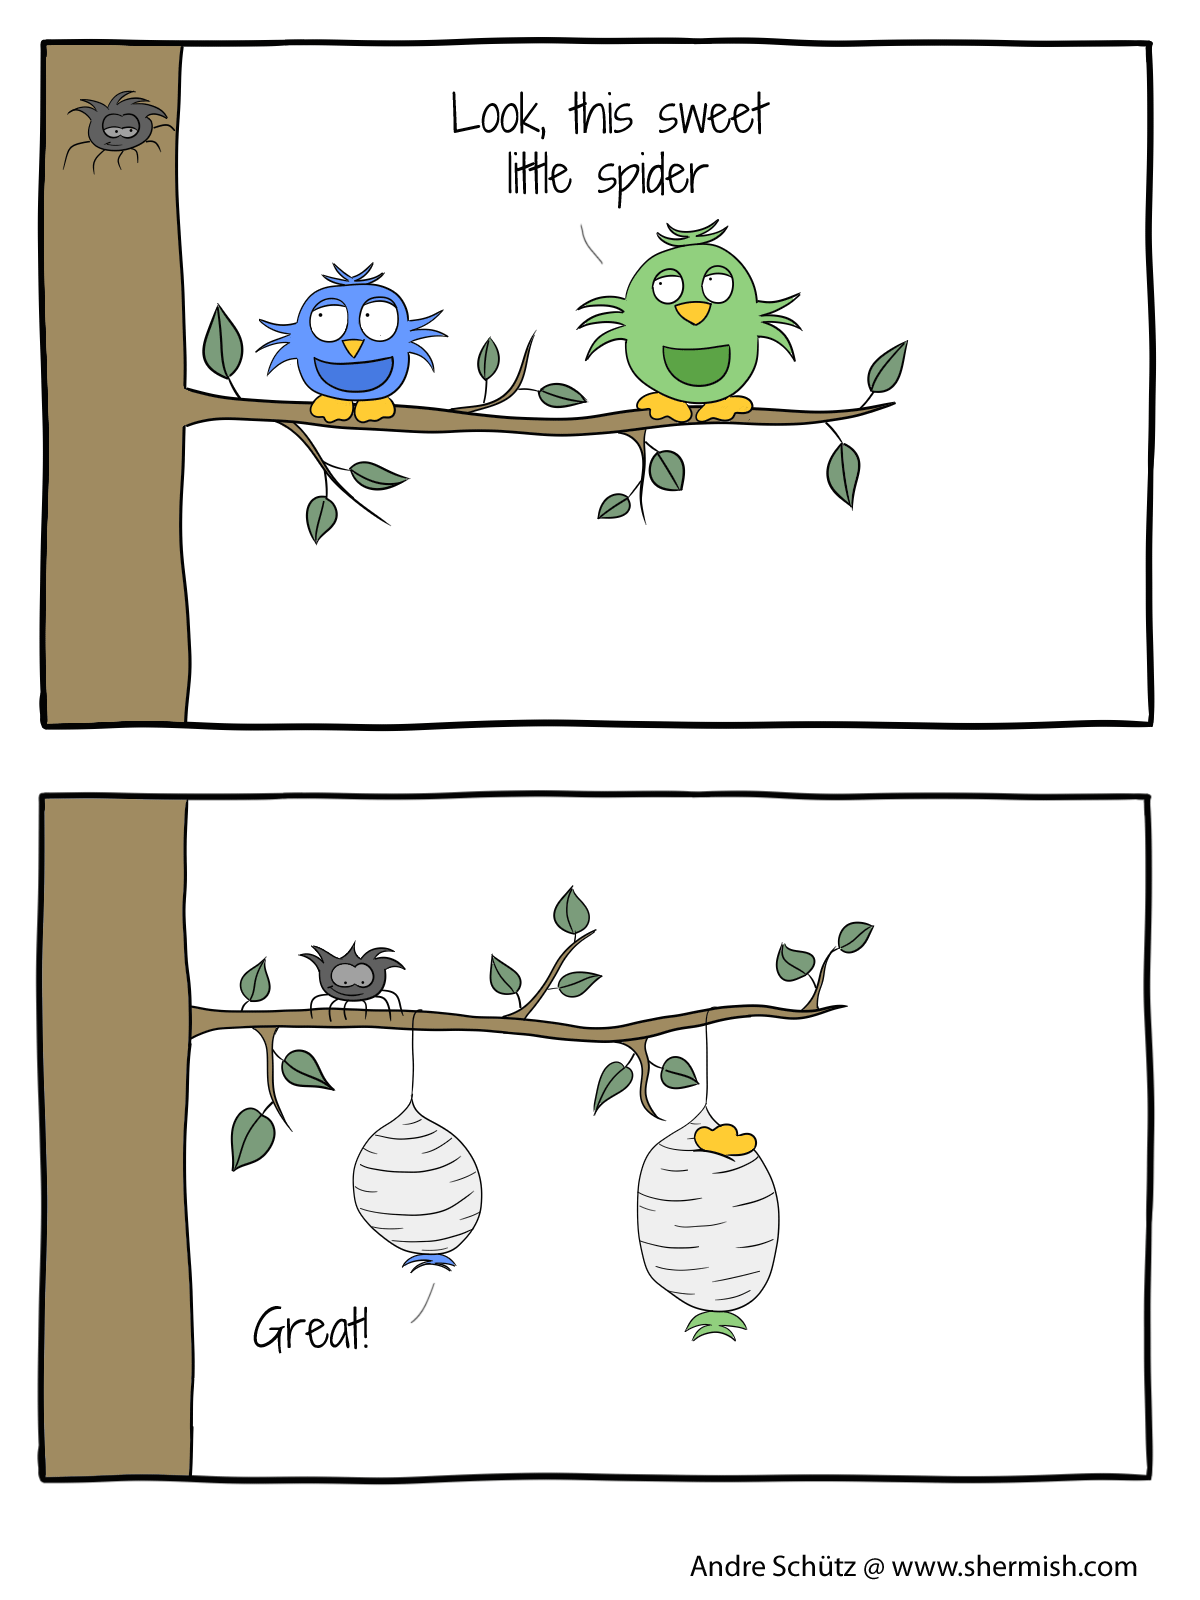 Birds: Never underestimate the little ones - sweet little spider